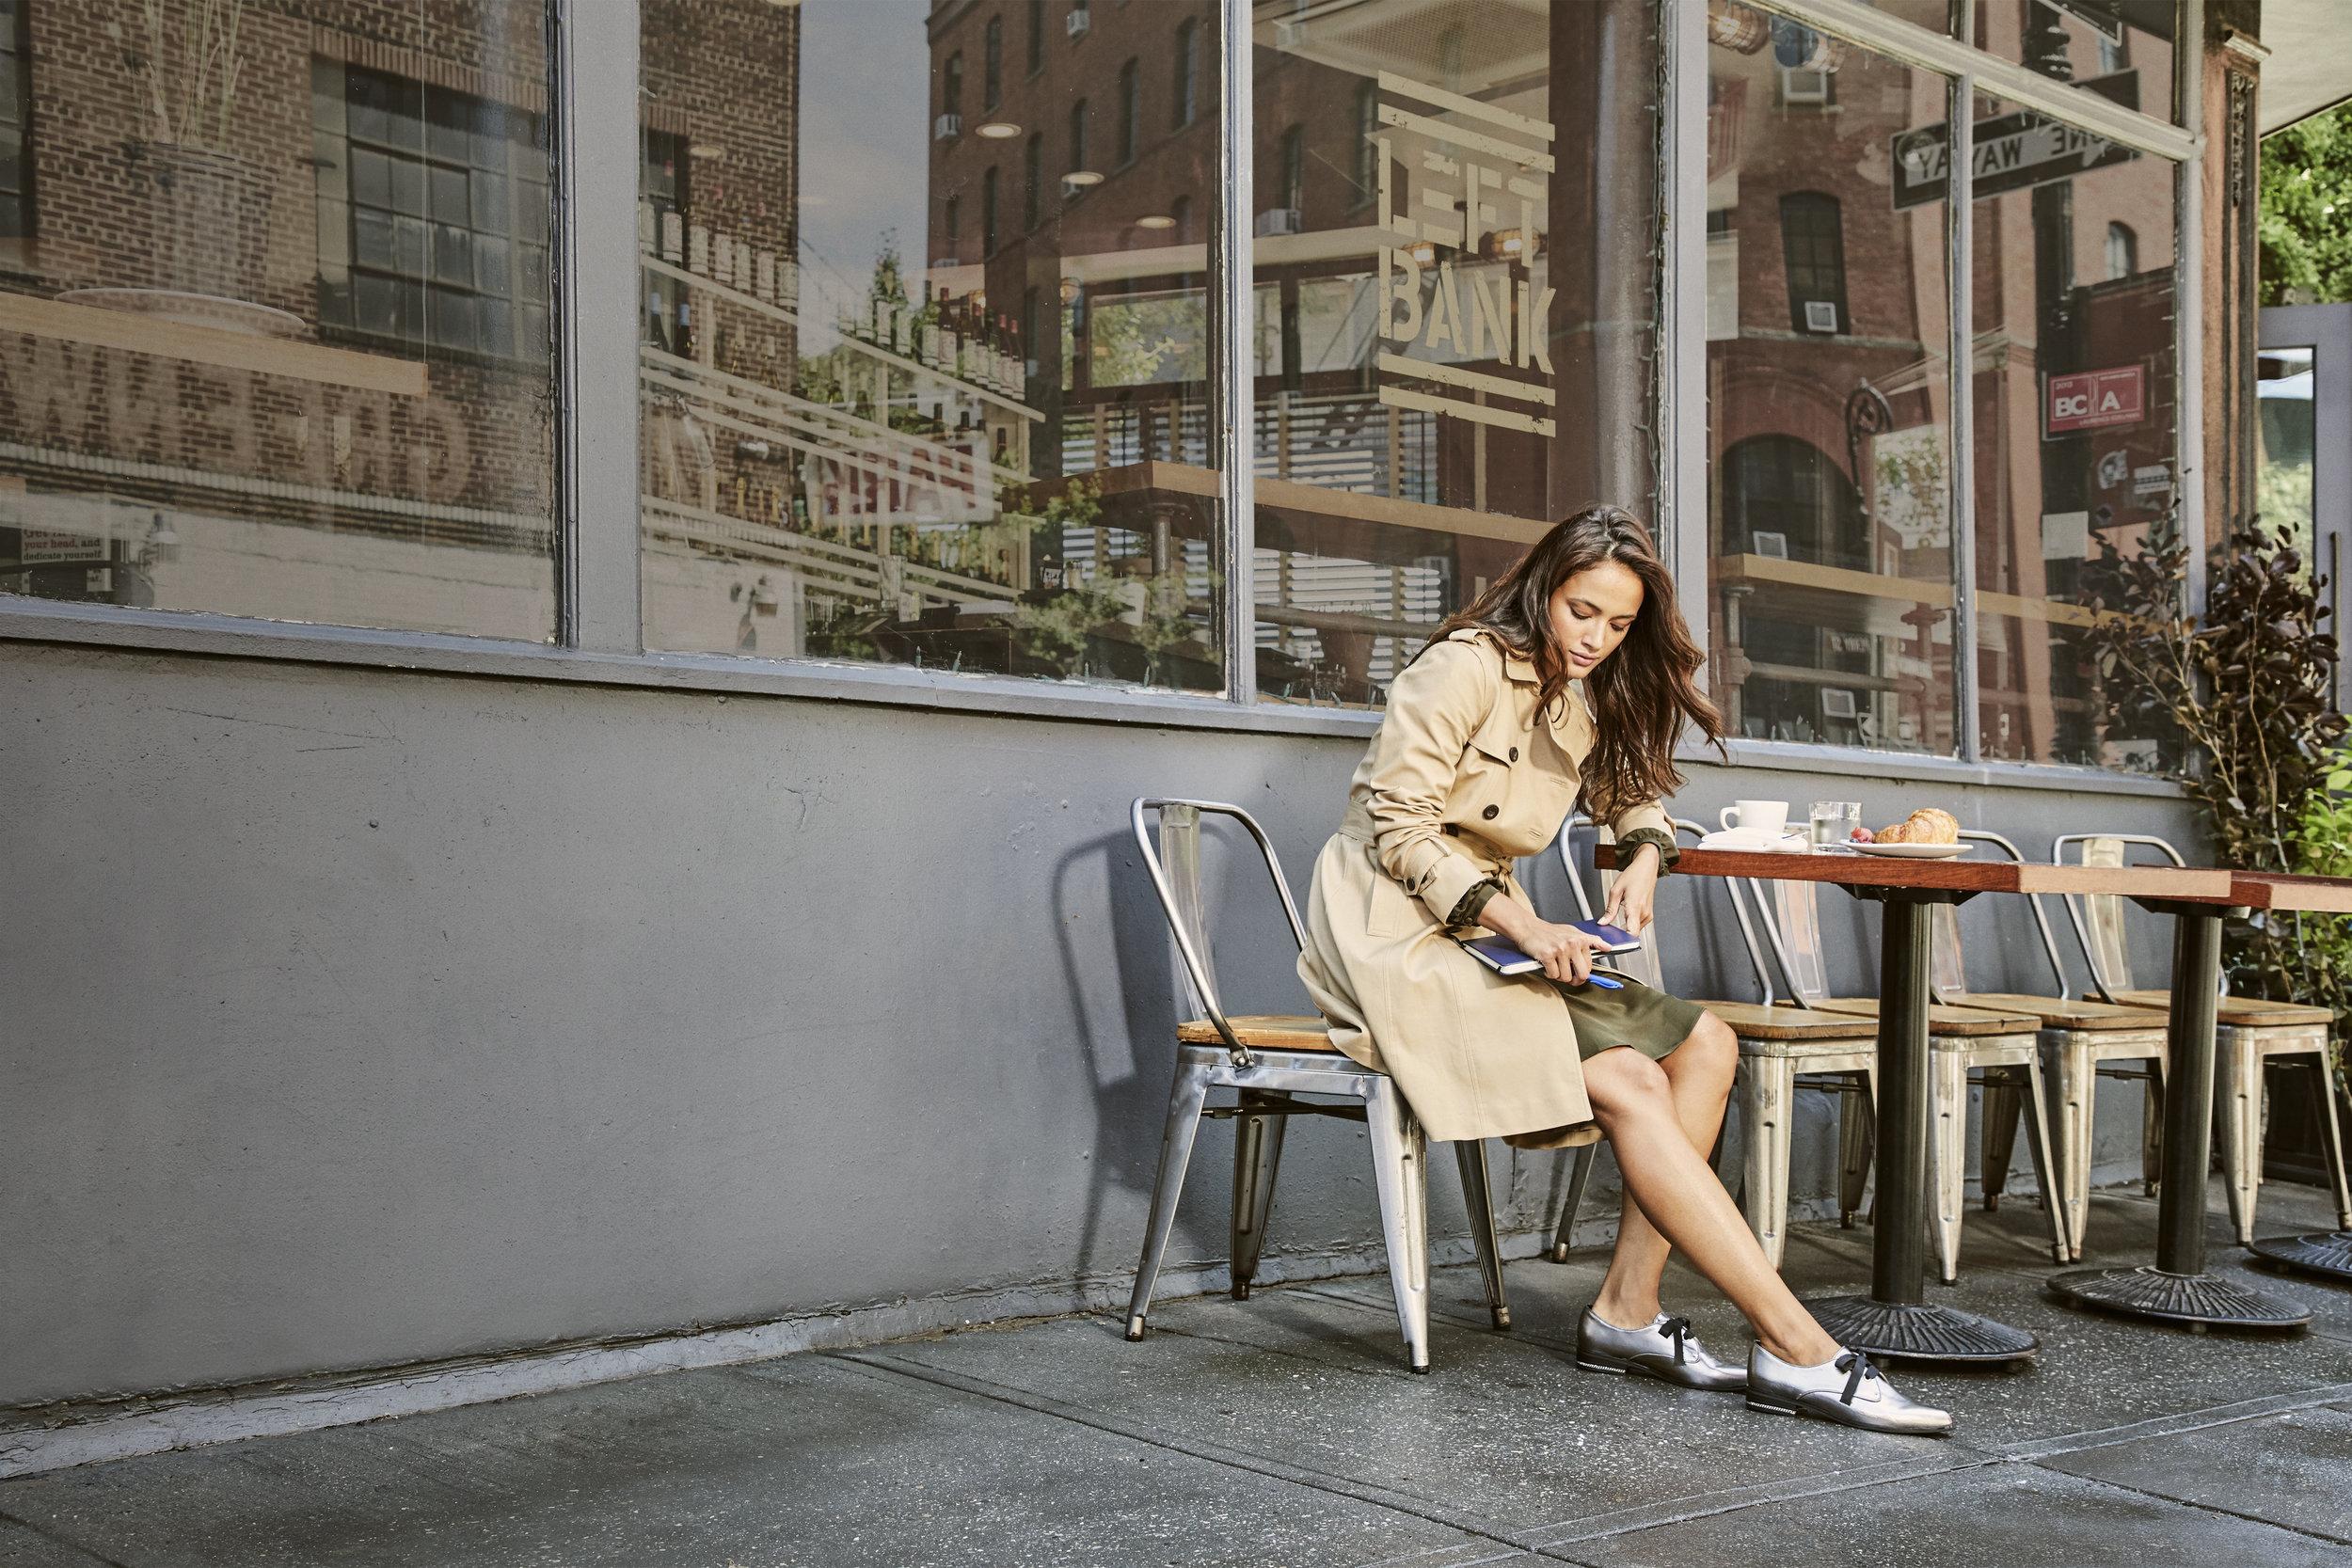 Shoes_Look04_267_40m_V3_xl.jpg